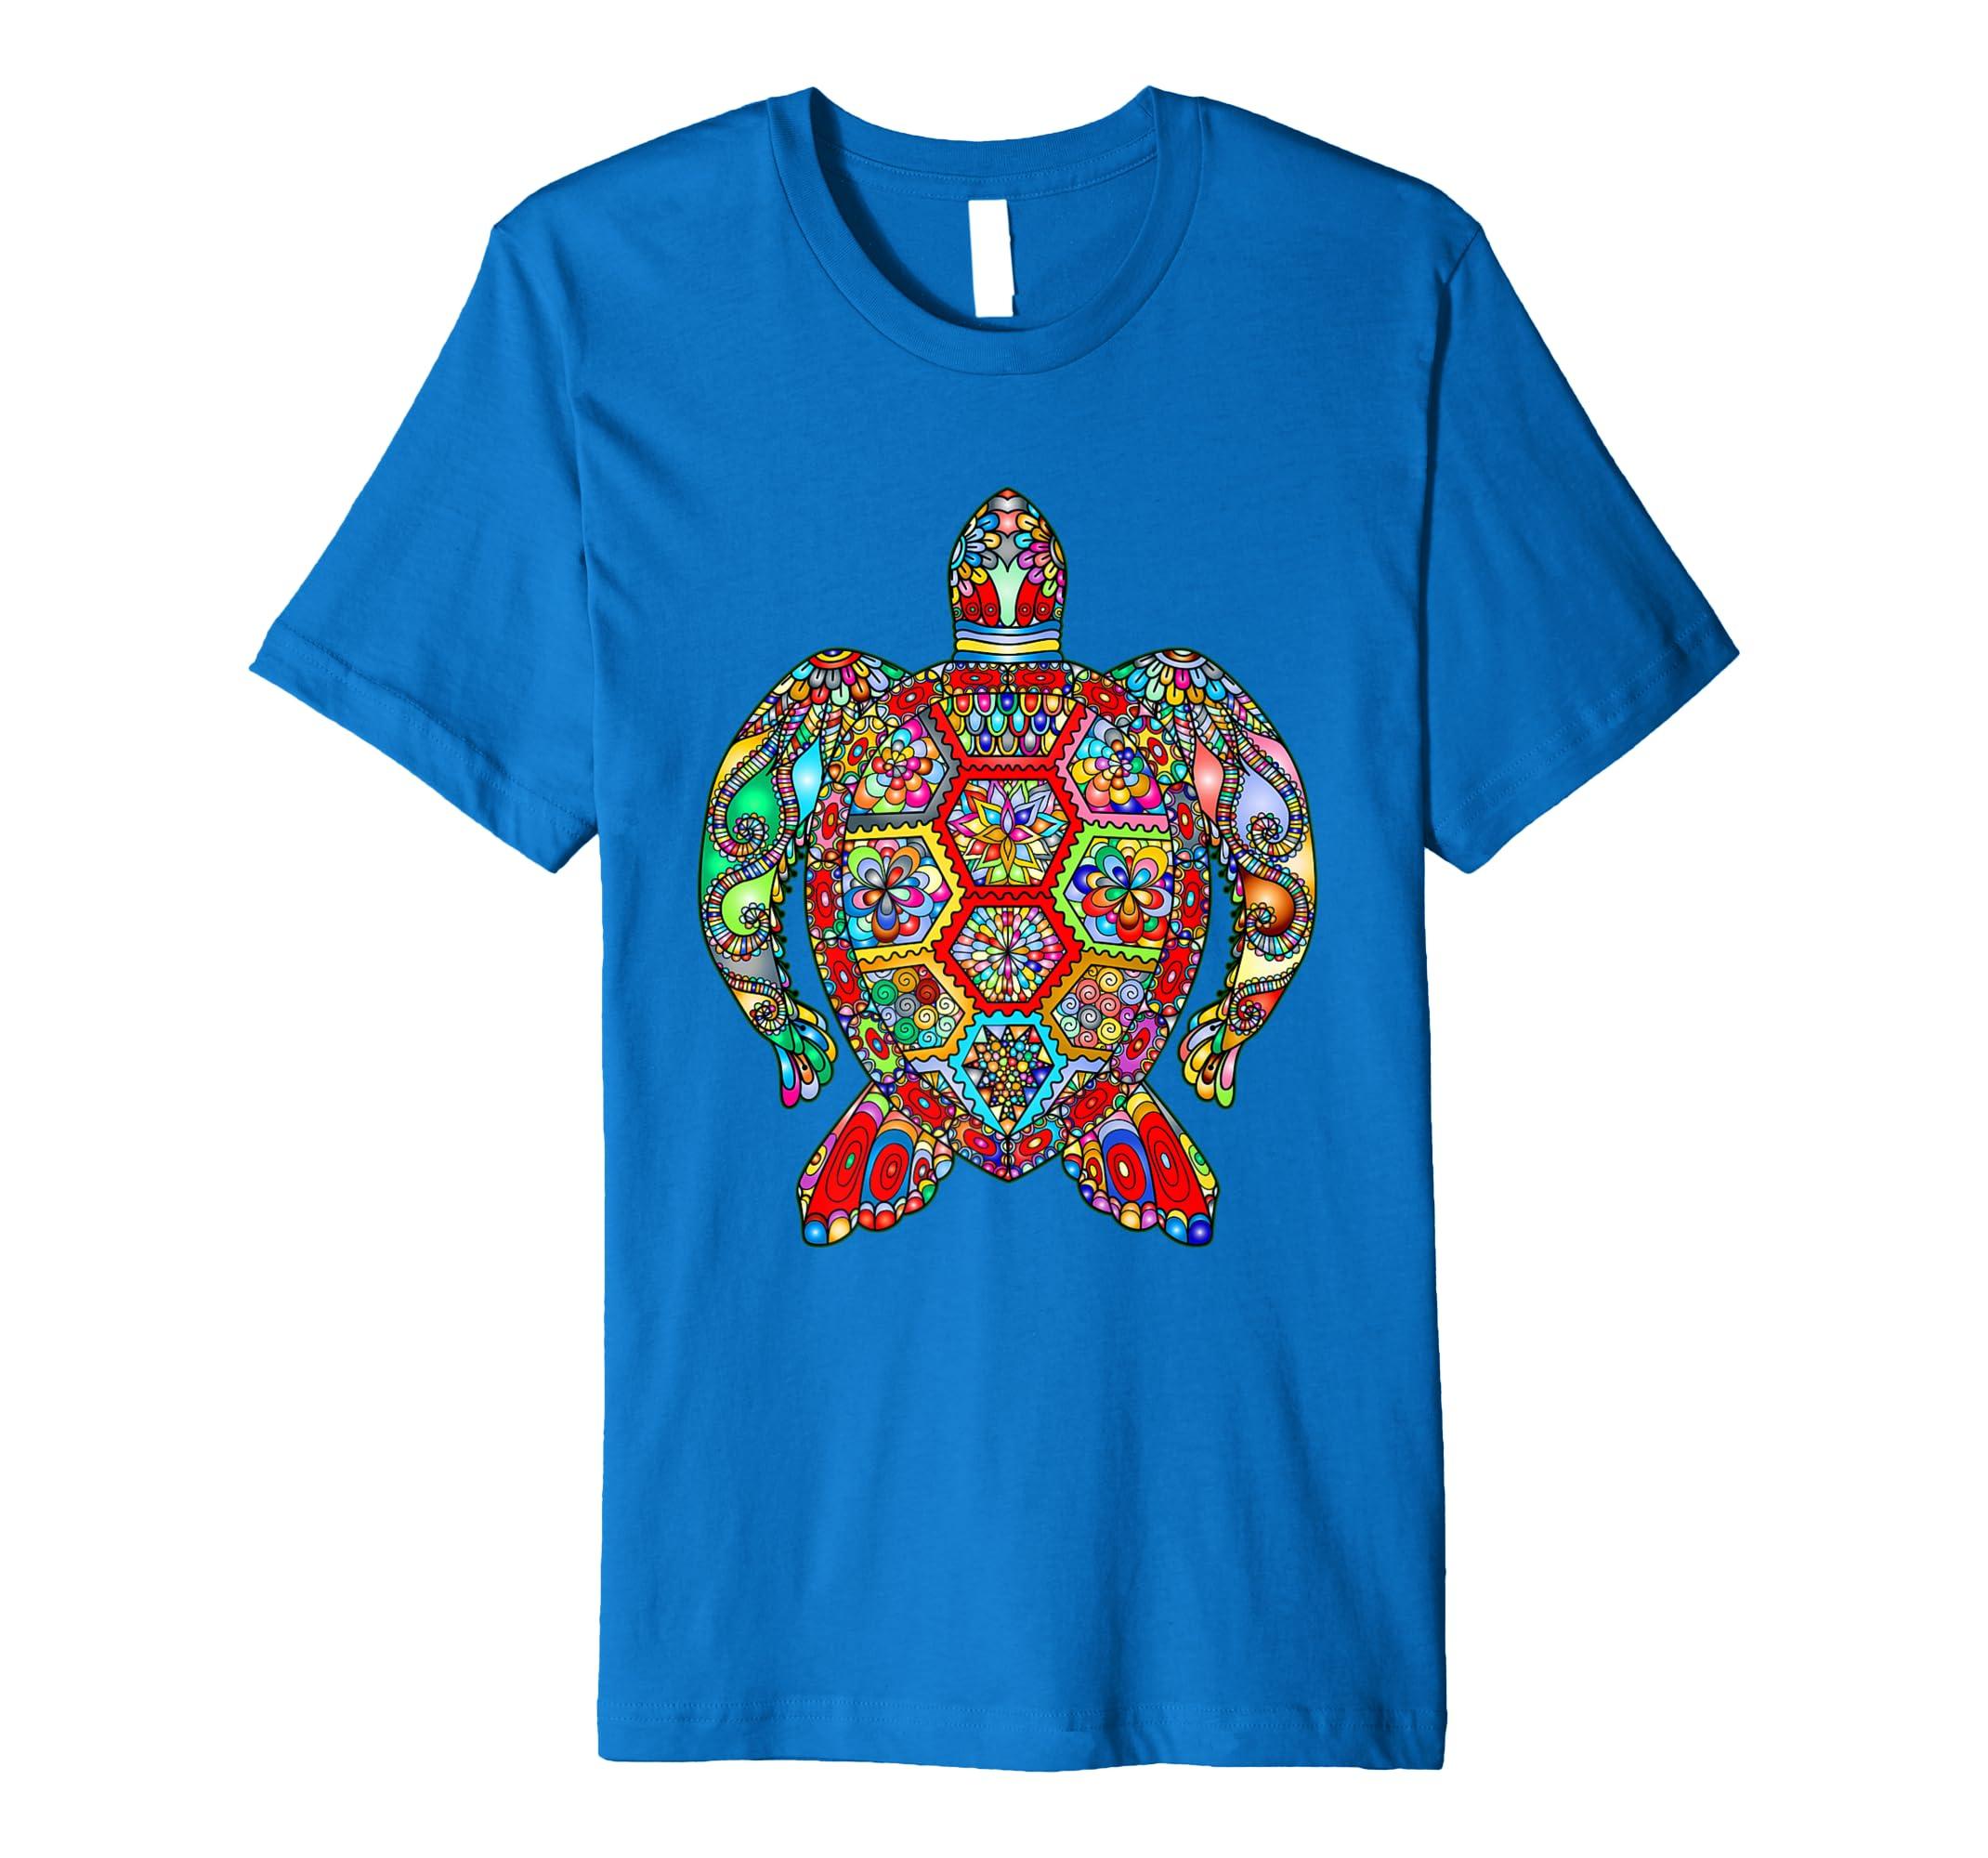 0a6c71fcb17 Sea Turtle Mandala Vibrant Art Ocean Life Print T-Shirt